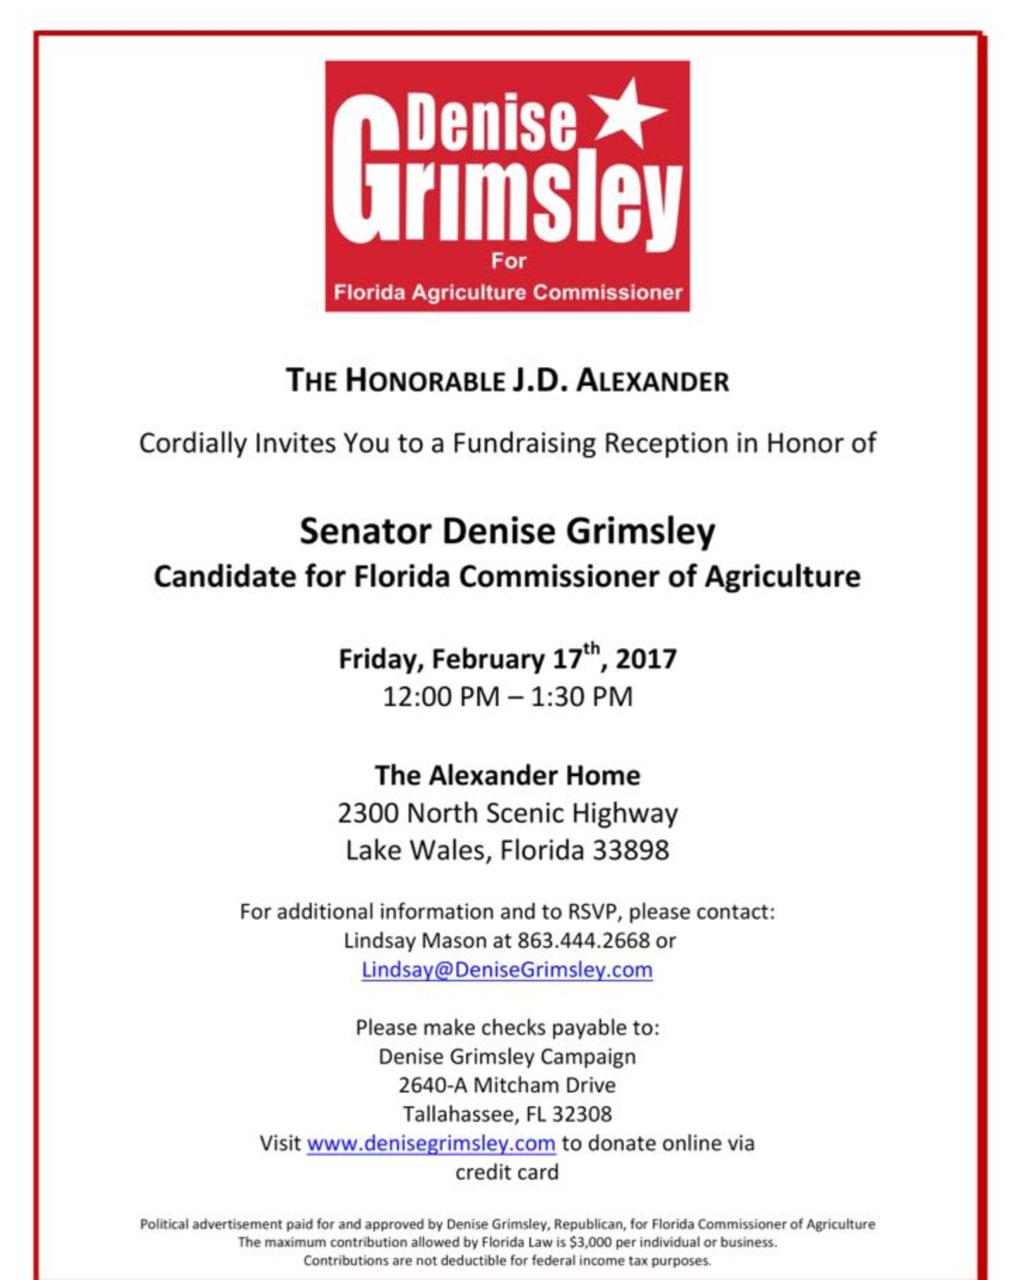 Denise Grimsley